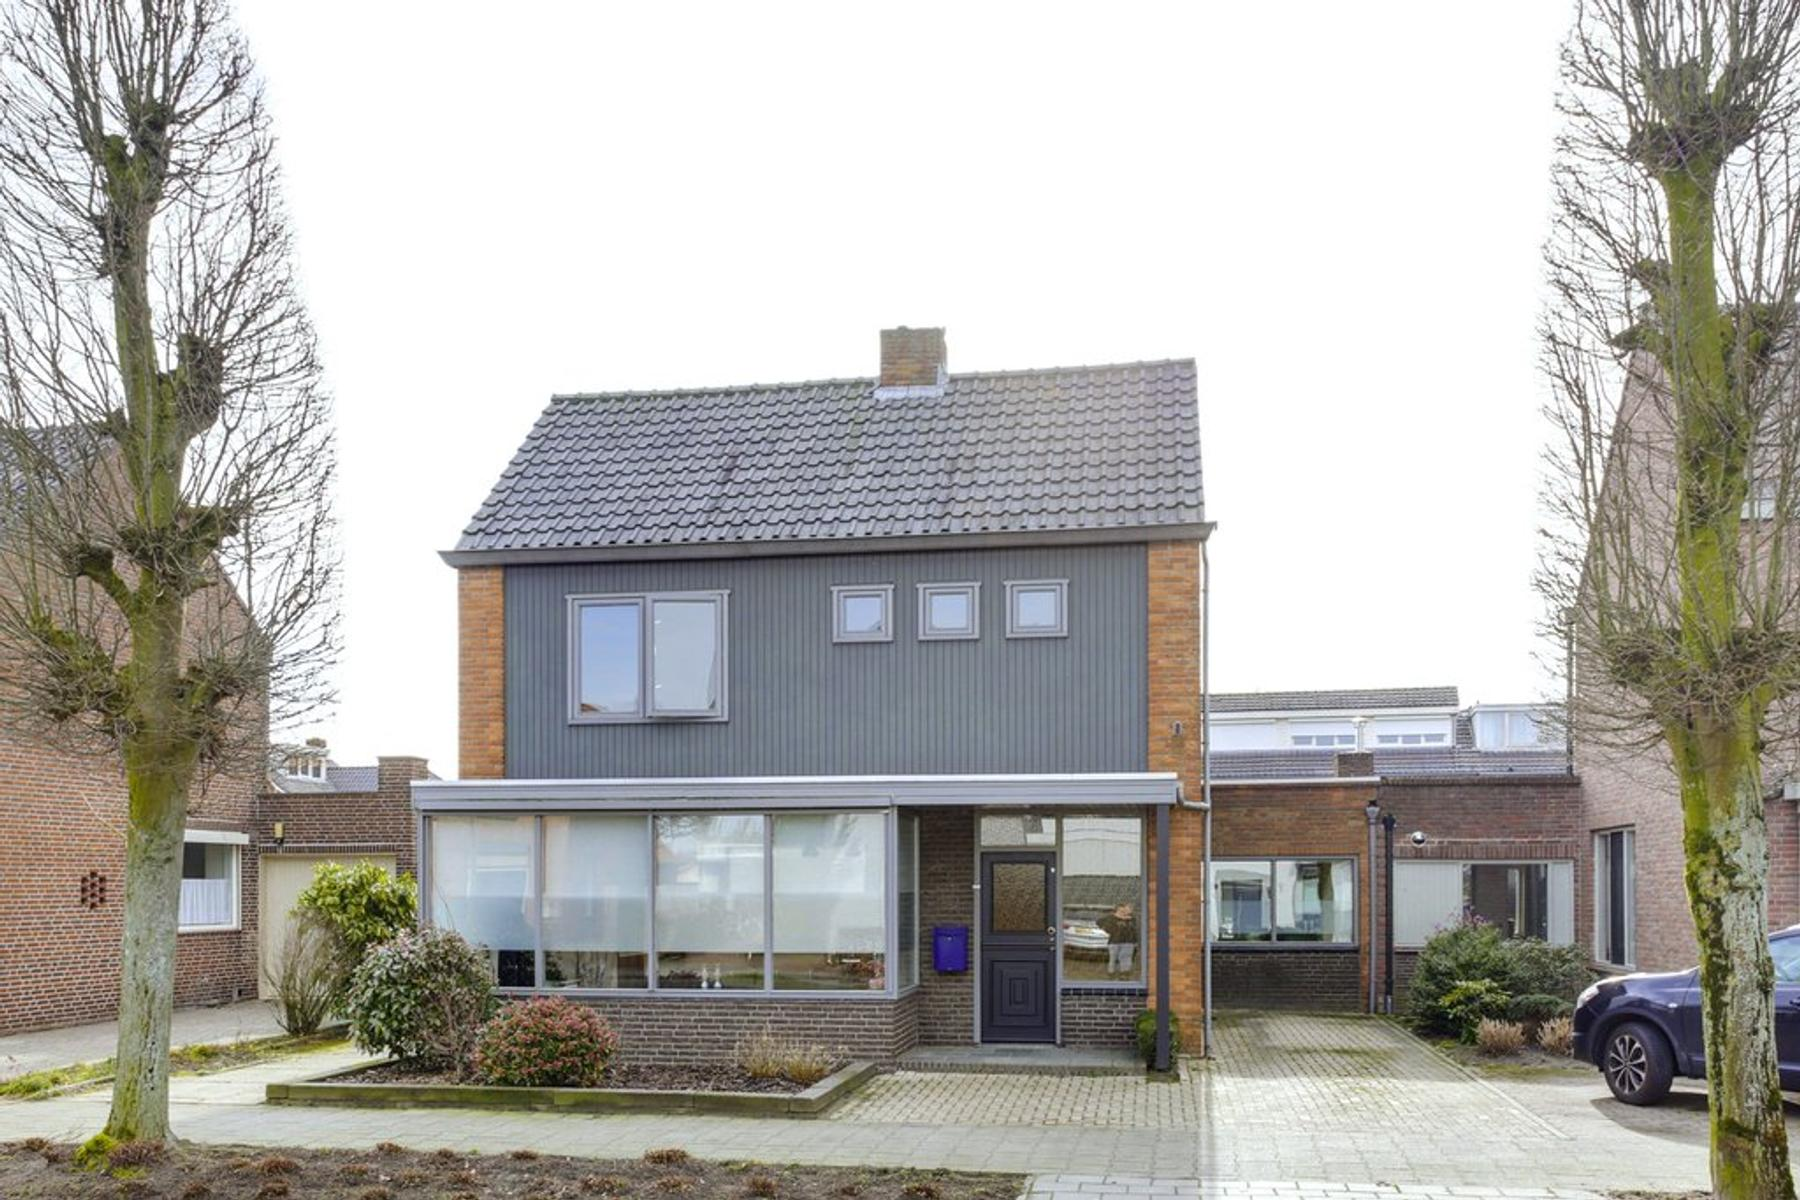 Veldstraat 41 in Zundert 4881 BA